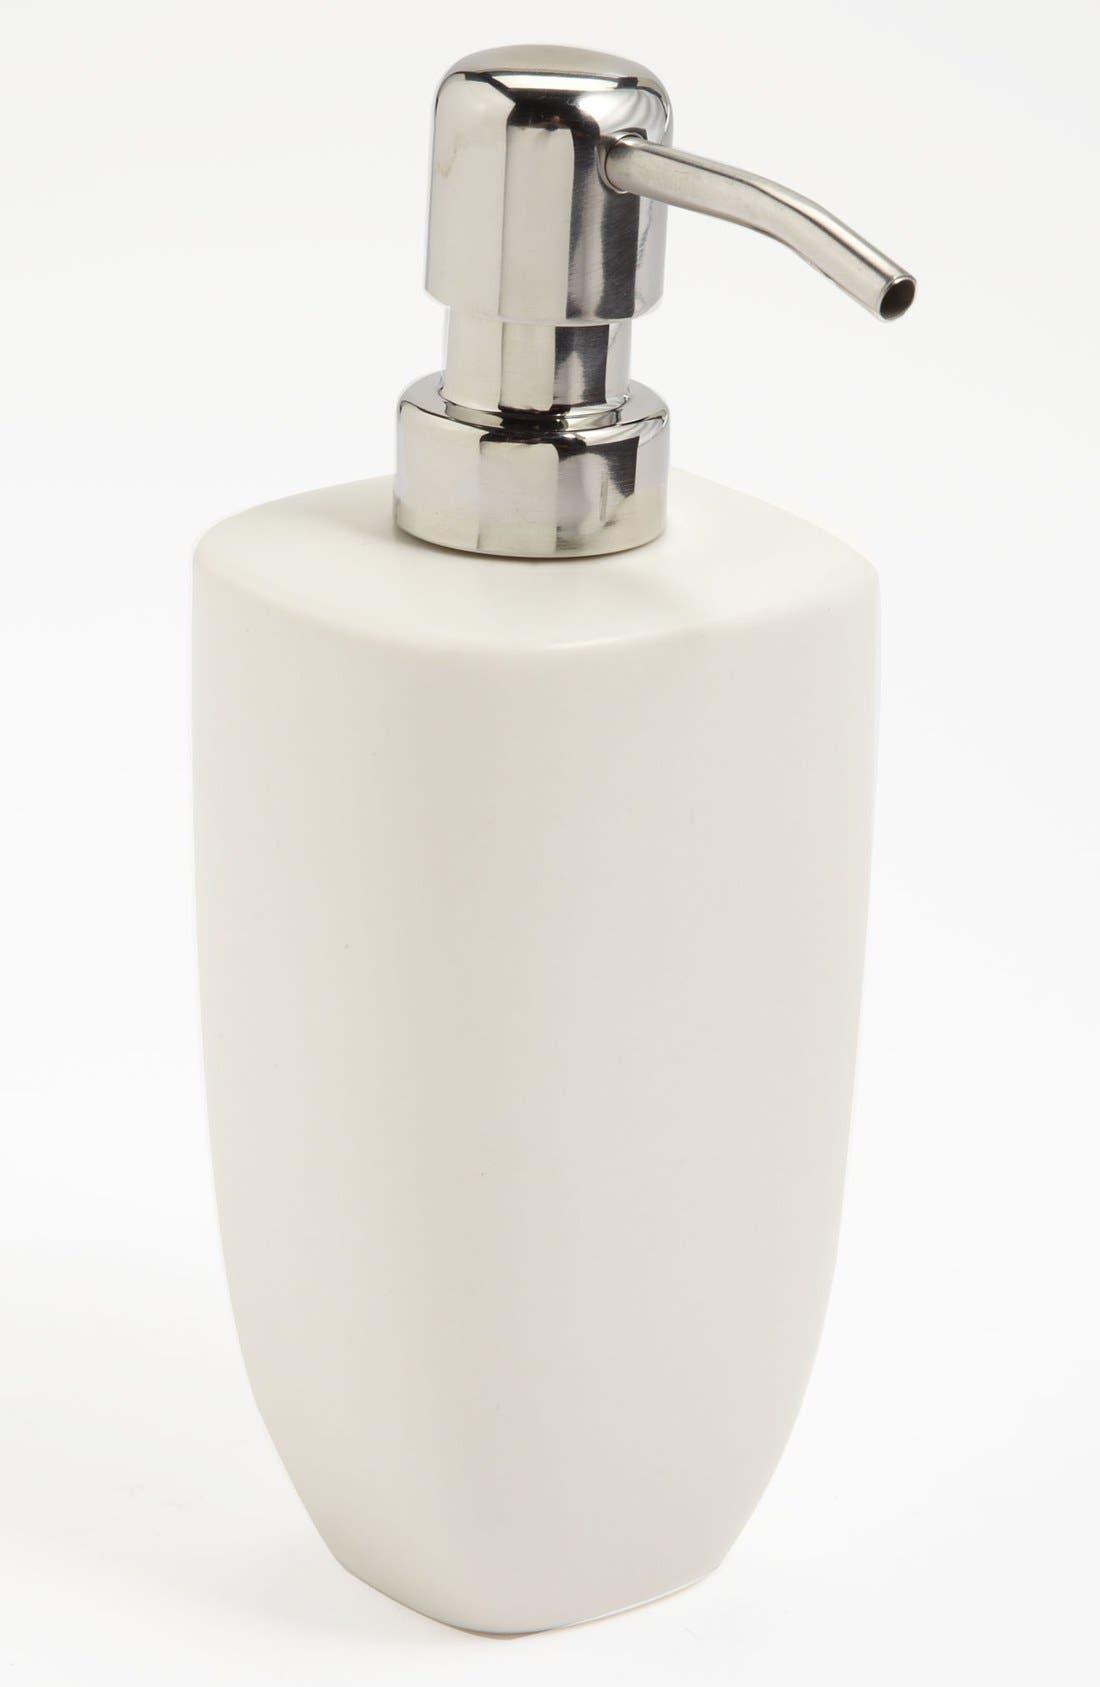 Main Image - Waterworks Studio 'Modern Ceramic' Soap Dispenser (Online Only)